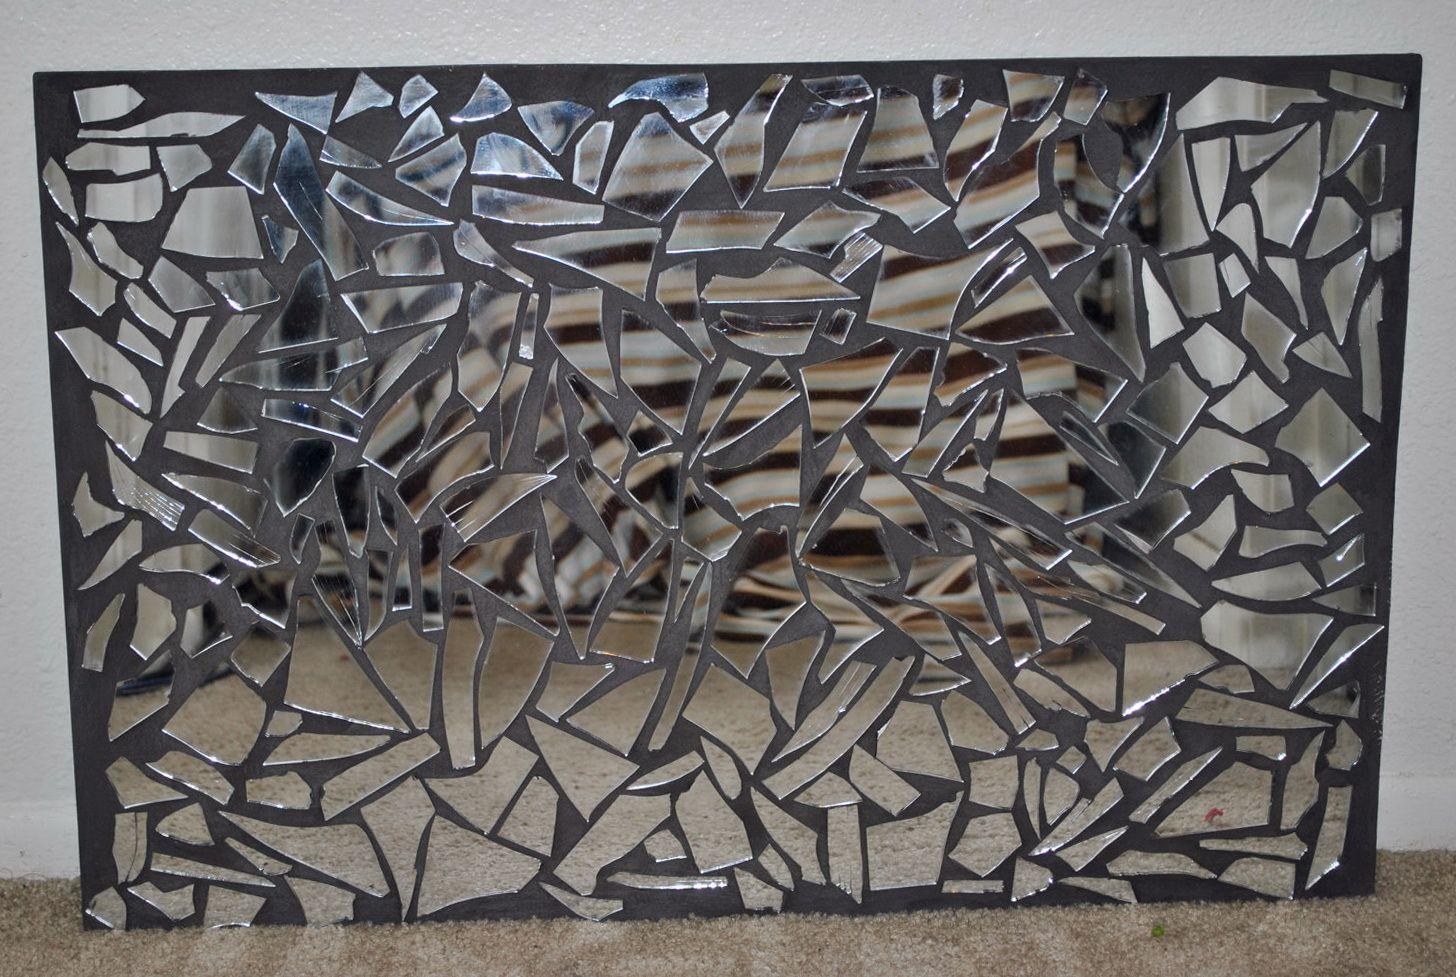 Mirror Mosaic Wall Art